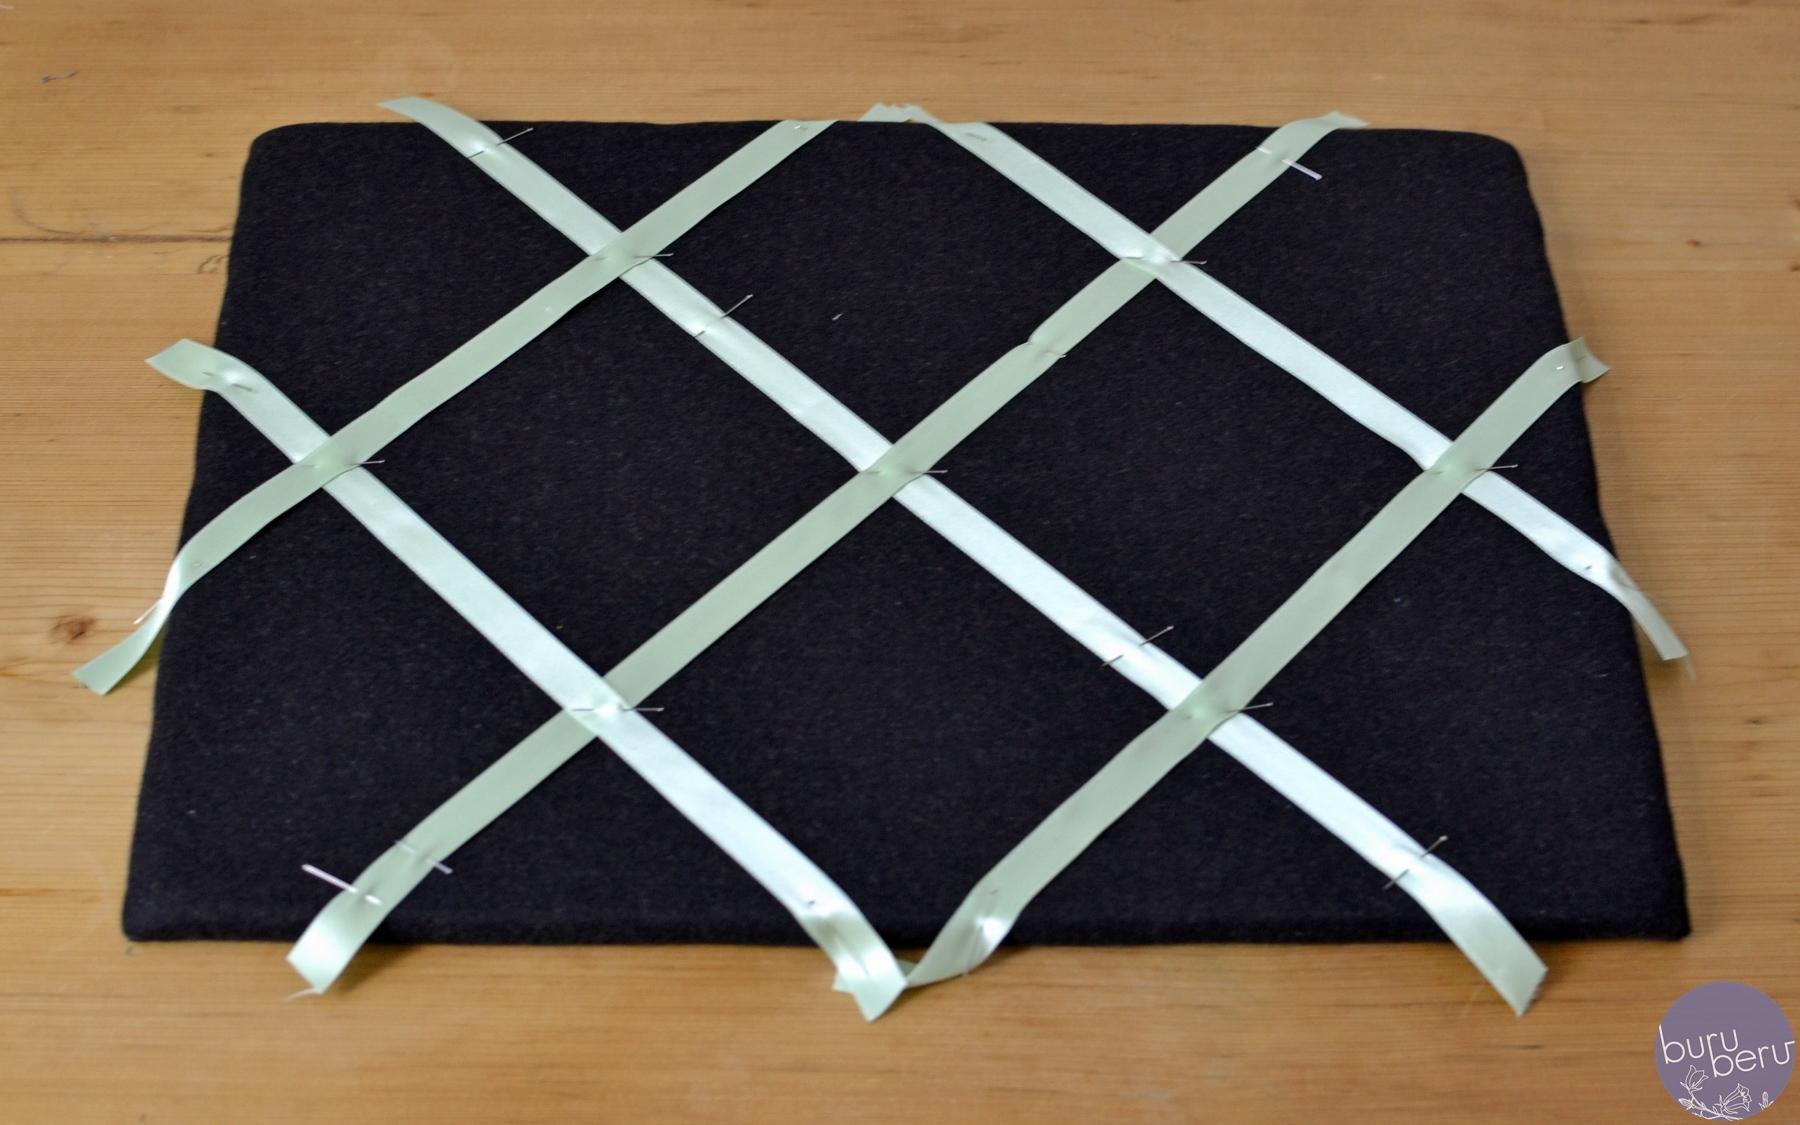 faszinierend pinnwand selber machen stoff ebenbild erindzain. Black Bedroom Furniture Sets. Home Design Ideas